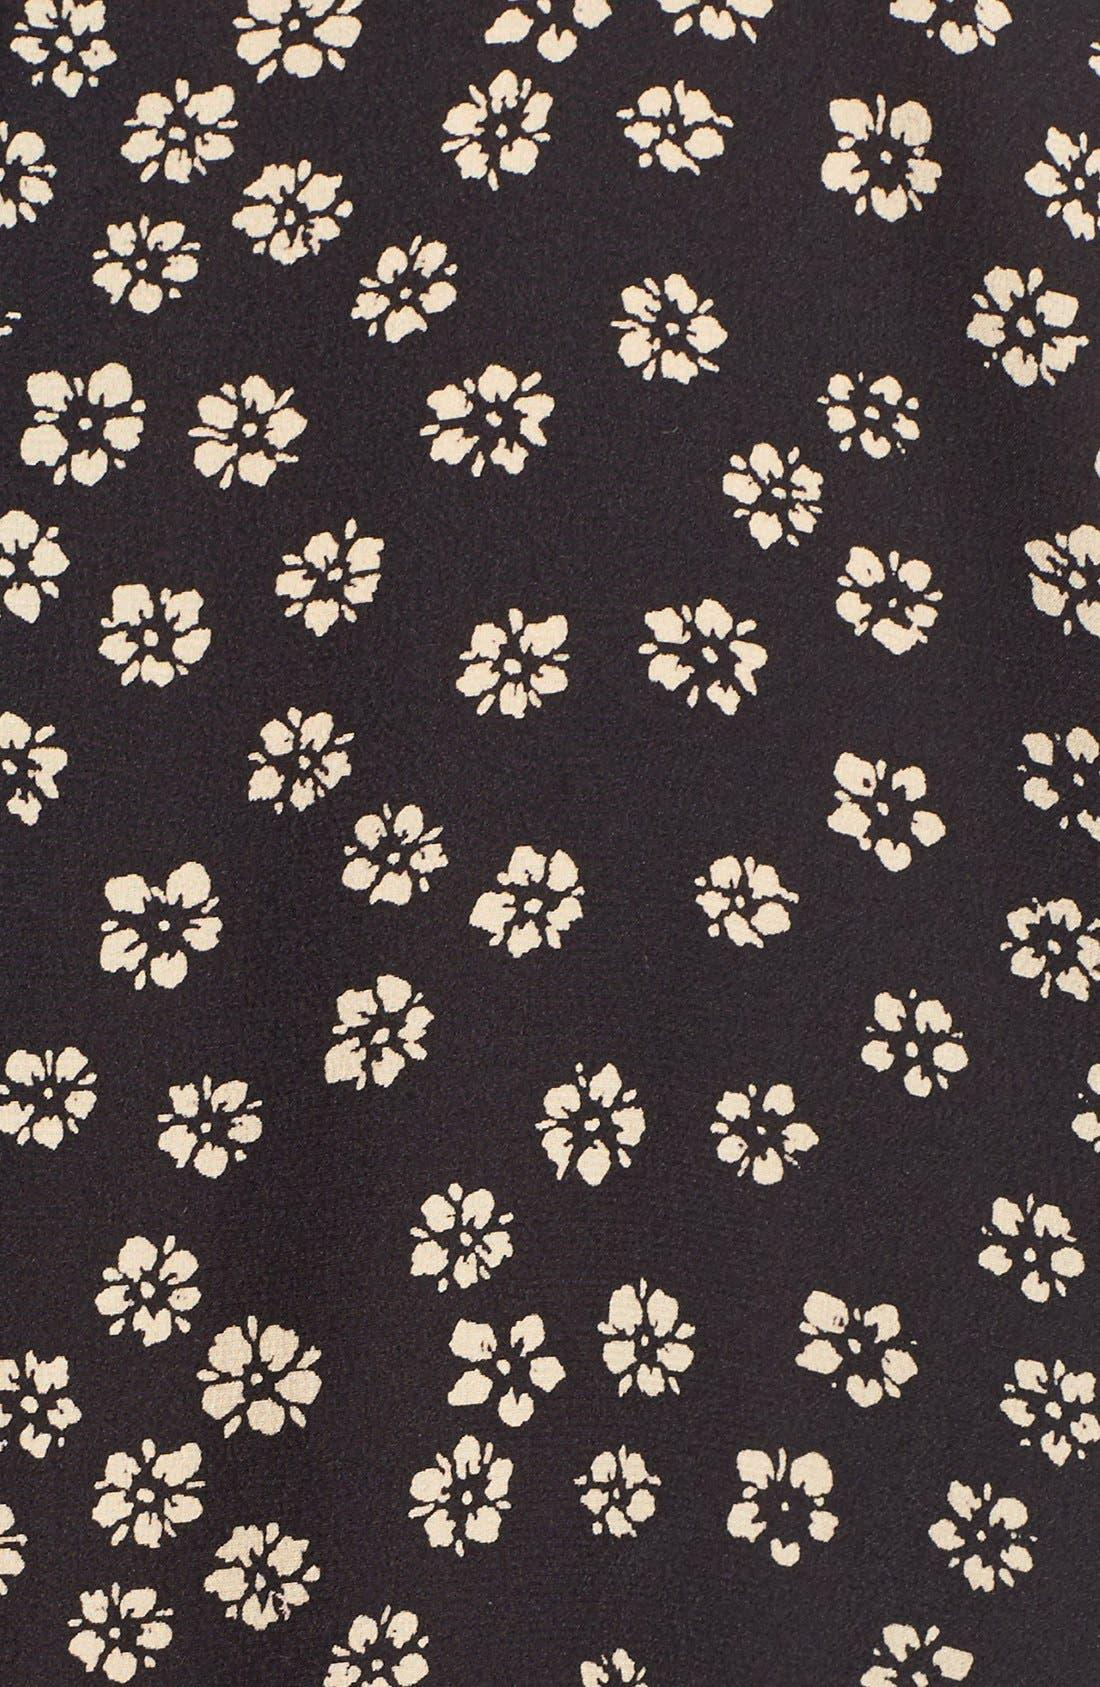 Floral Print Silk Blouse,                             Alternate thumbnail 6, color,                             Charcoal Grey